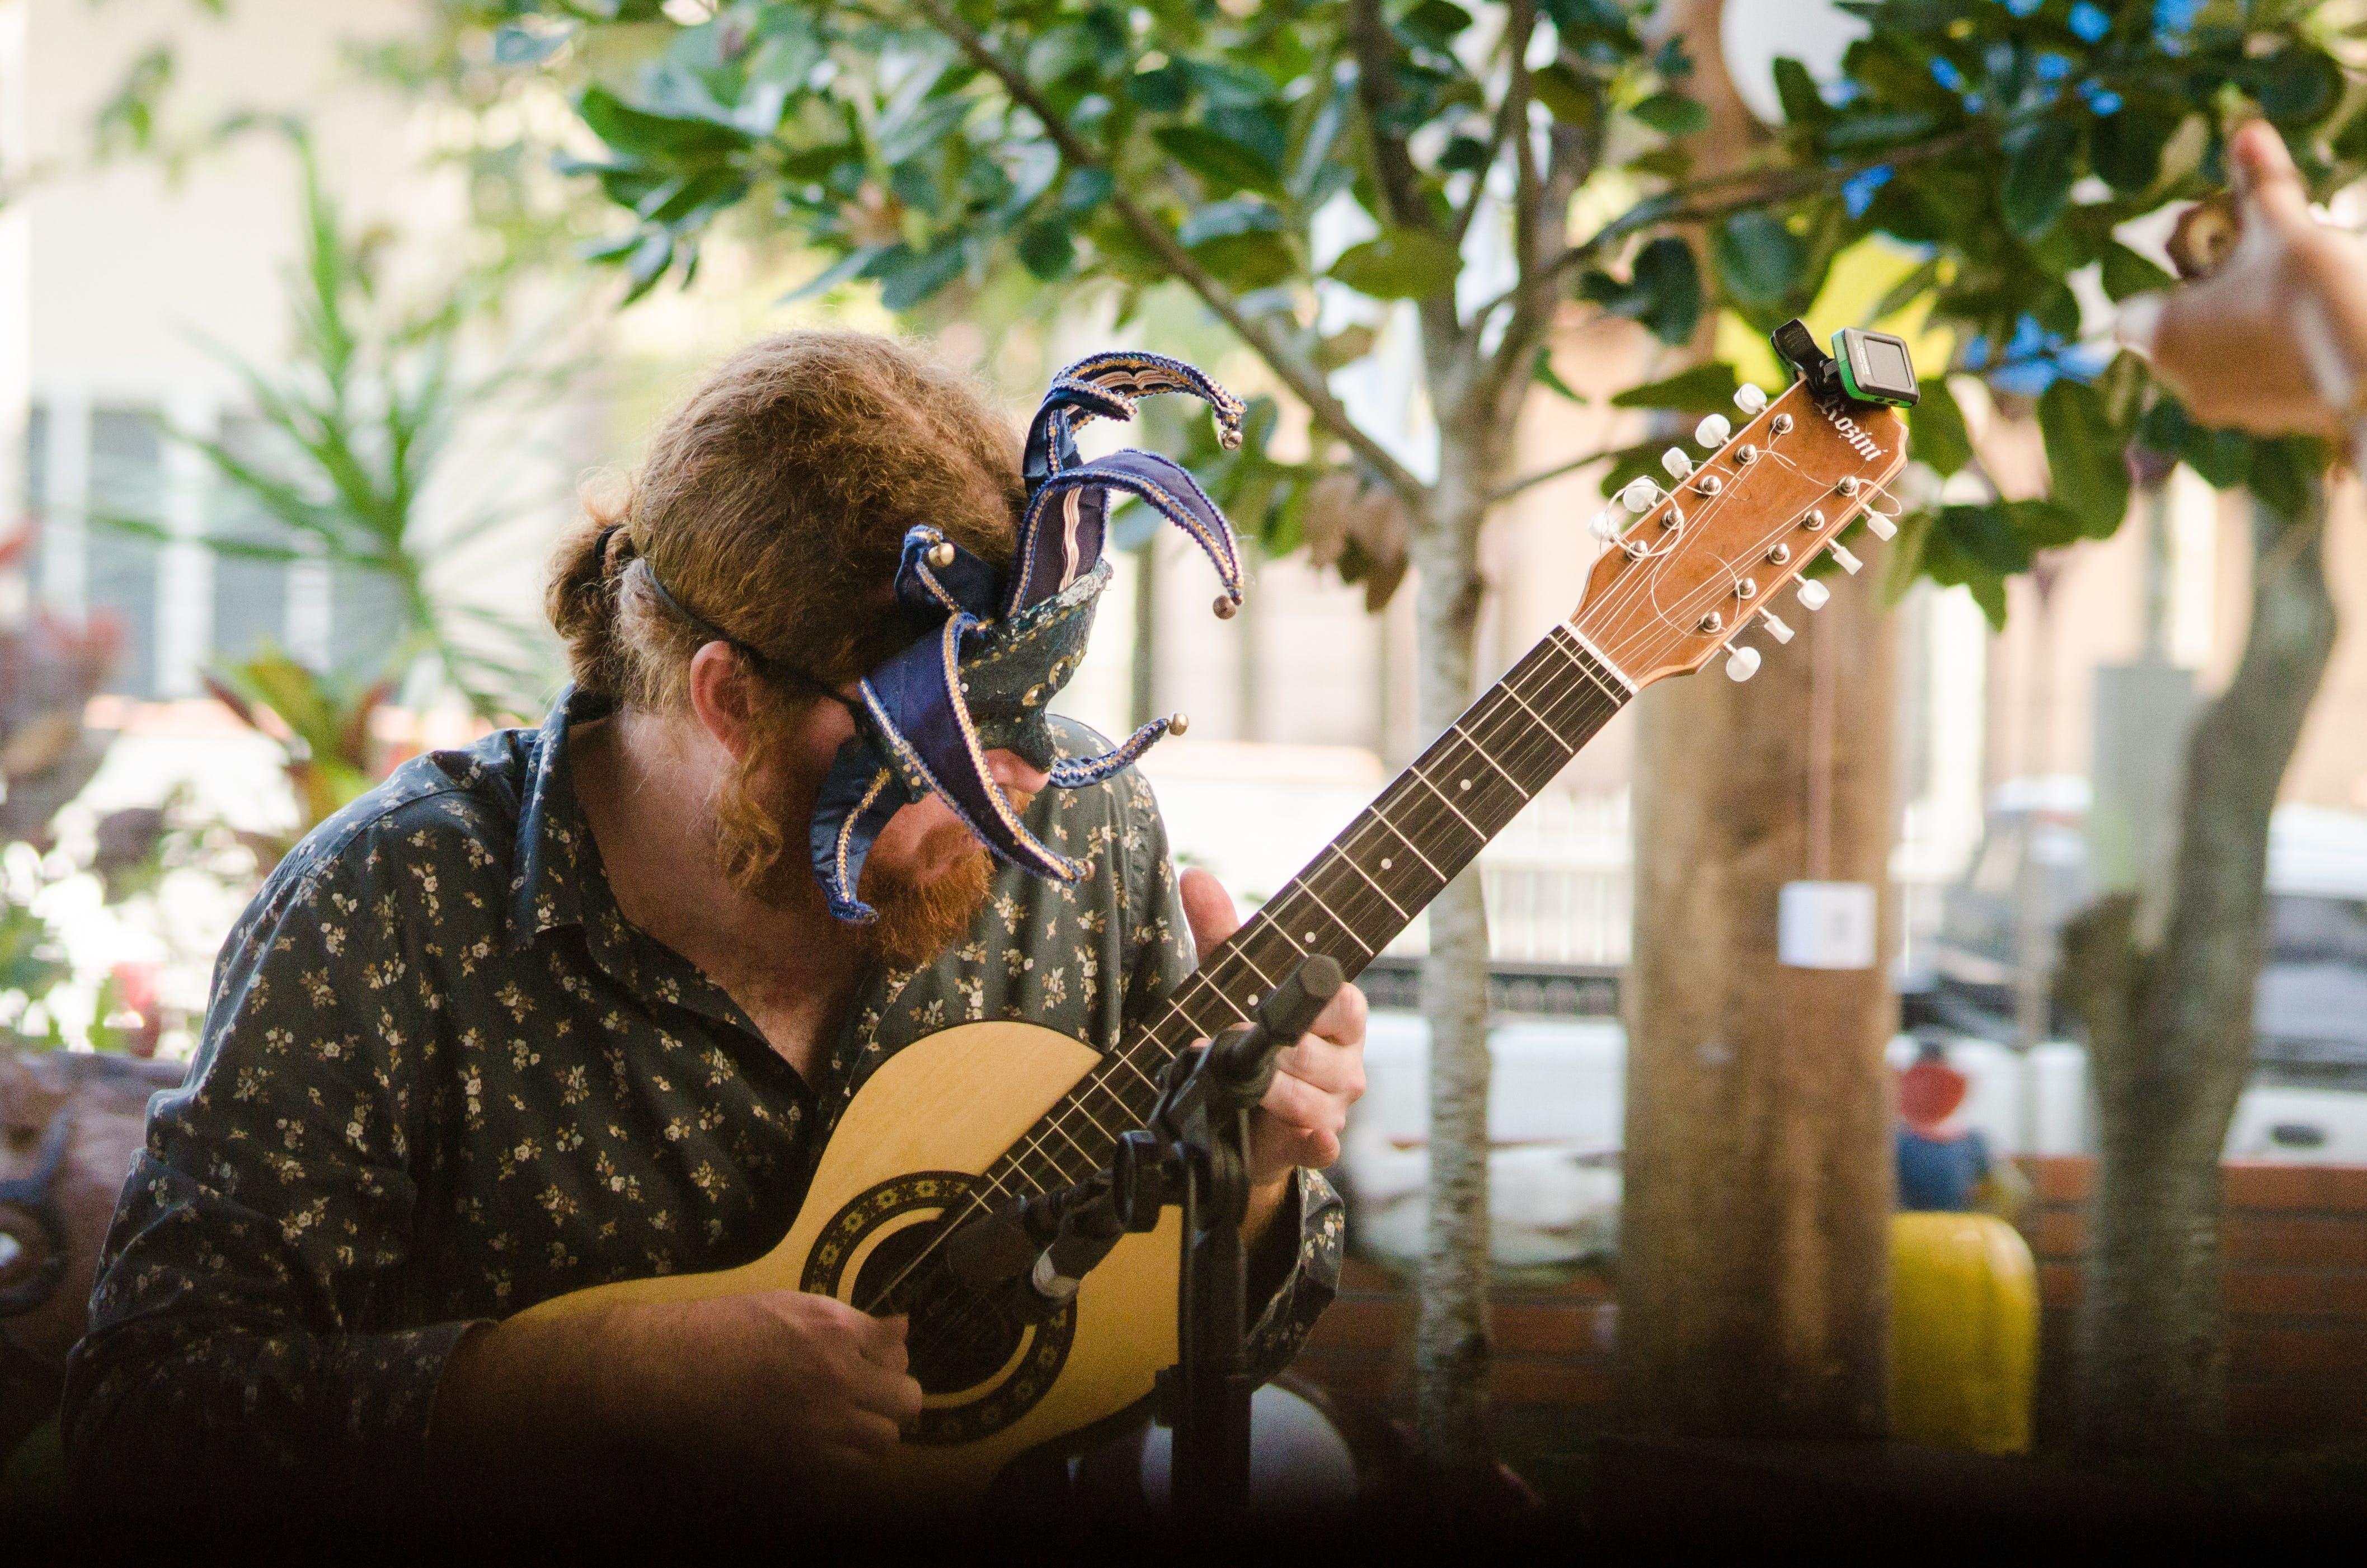 Free stock photo of creativity, guitar, hands, live